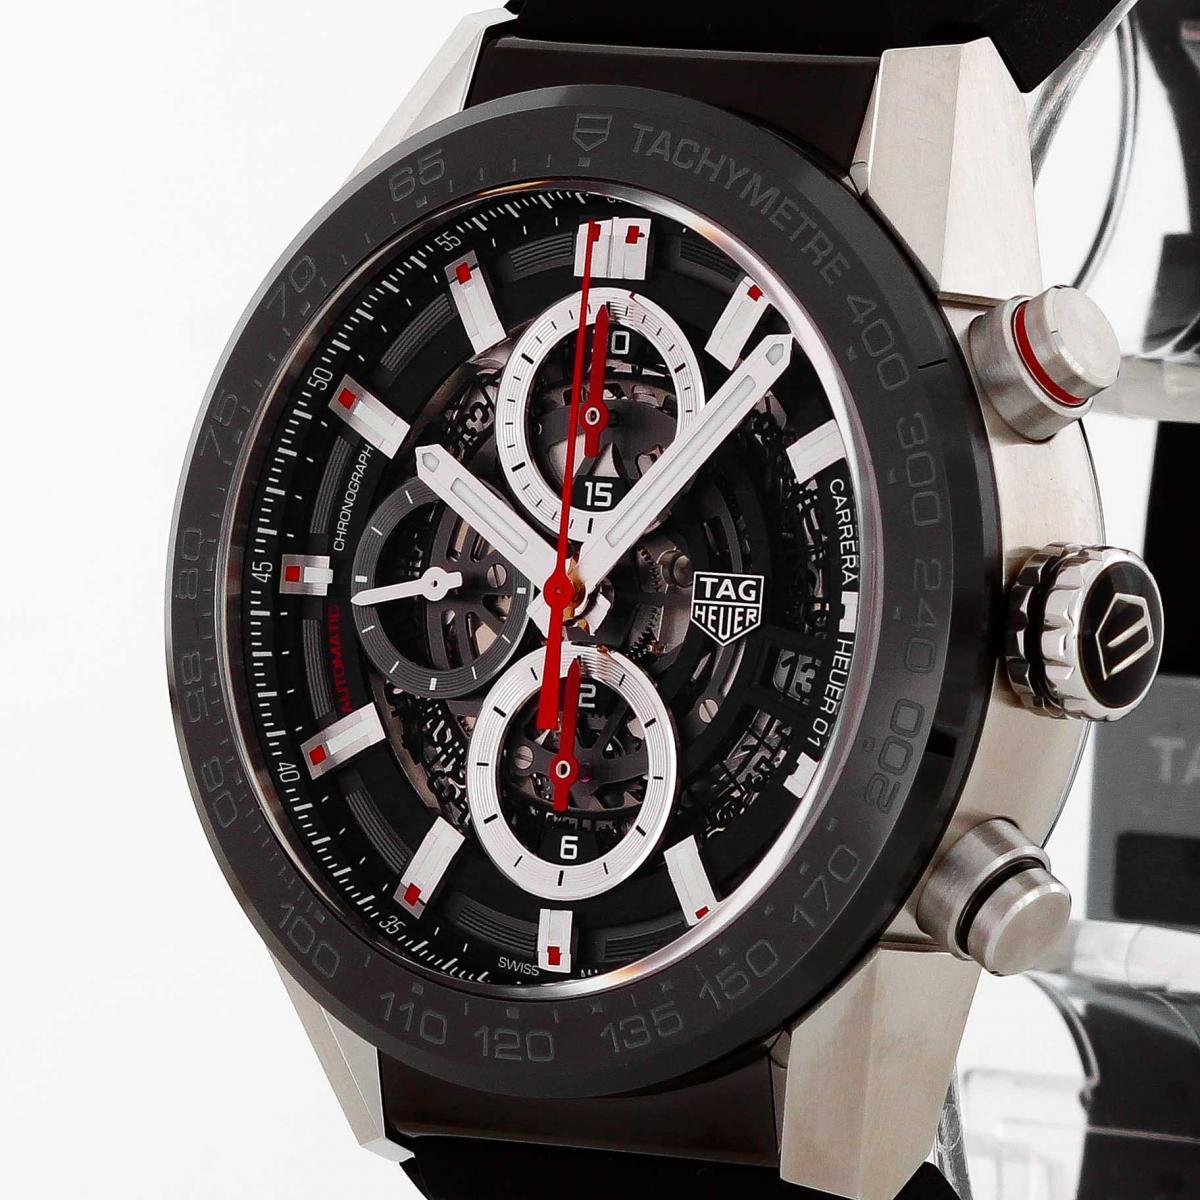 TAG Heuer Carrera Chronograph Calibre Heuer 01 Edelstahl an Kautschuk CAR201V.FT6046